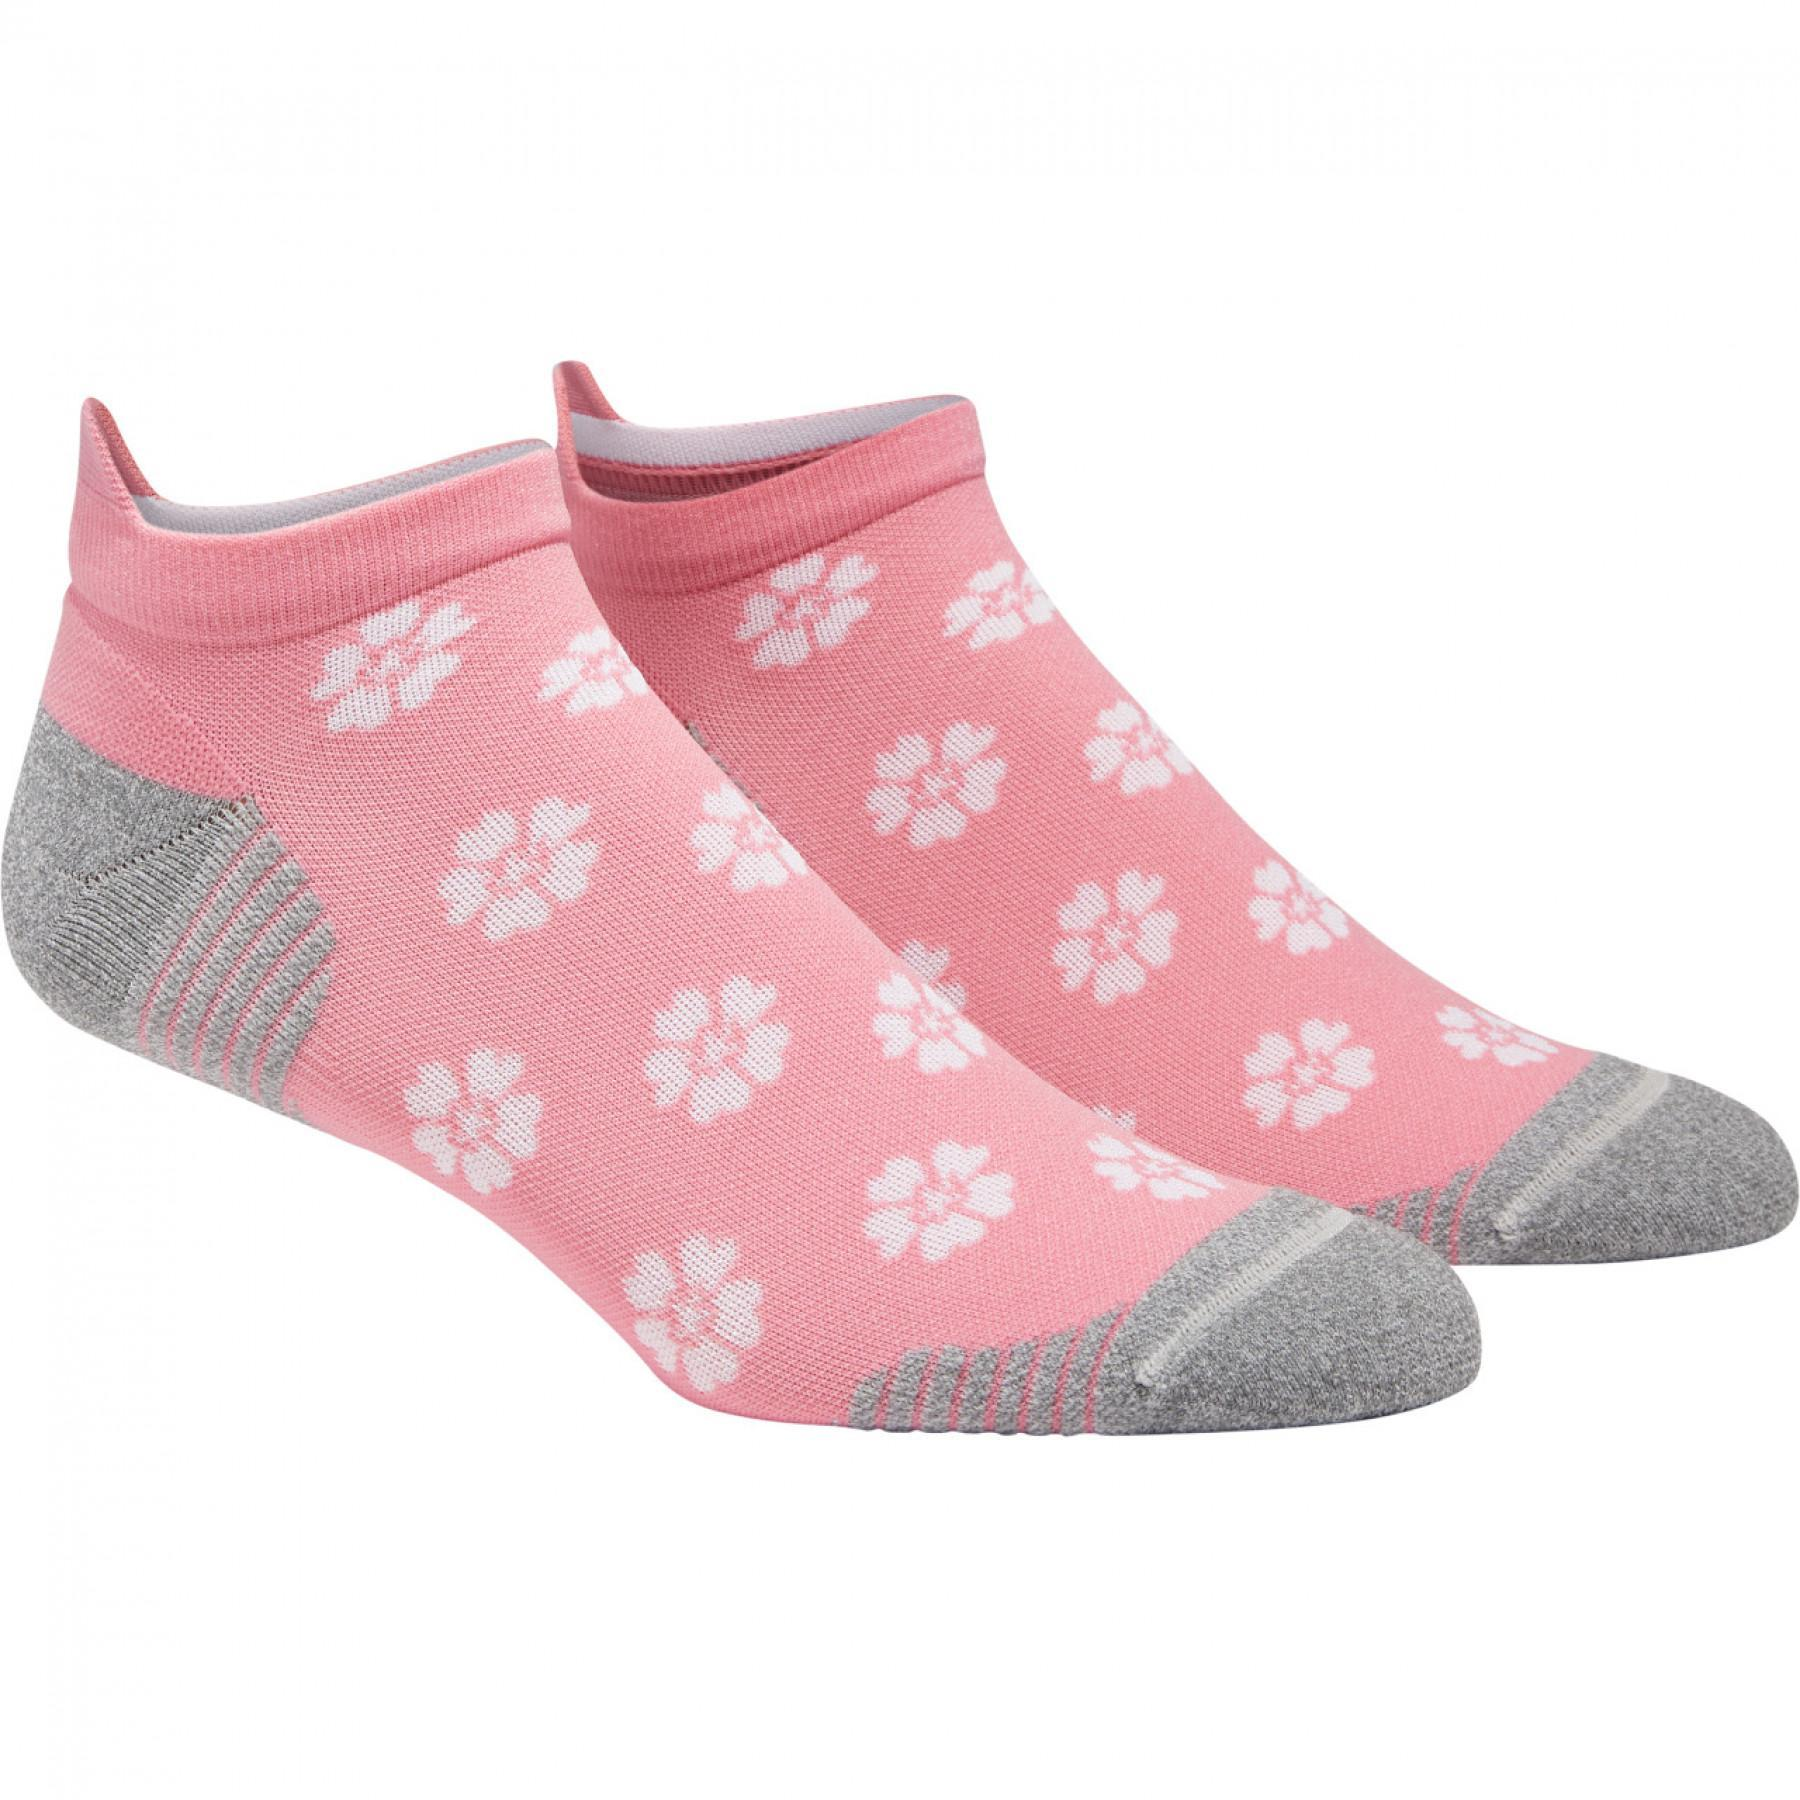 Socks Asics Sakura